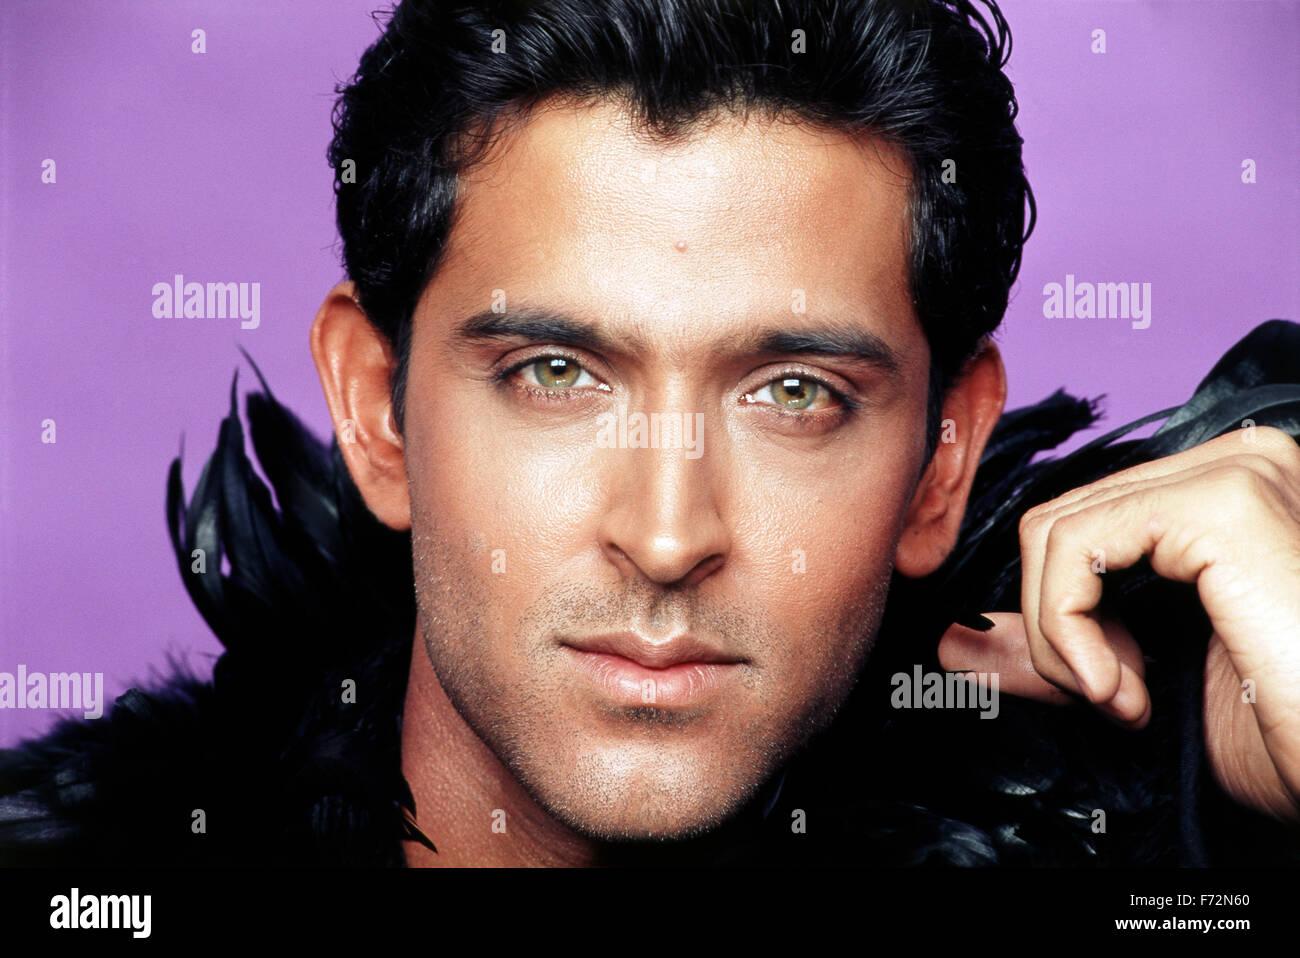 acteur de cin ma indien hrithik roshan inde asie 2004 banque d 39 images photo stock 90414968. Black Bedroom Furniture Sets. Home Design Ideas